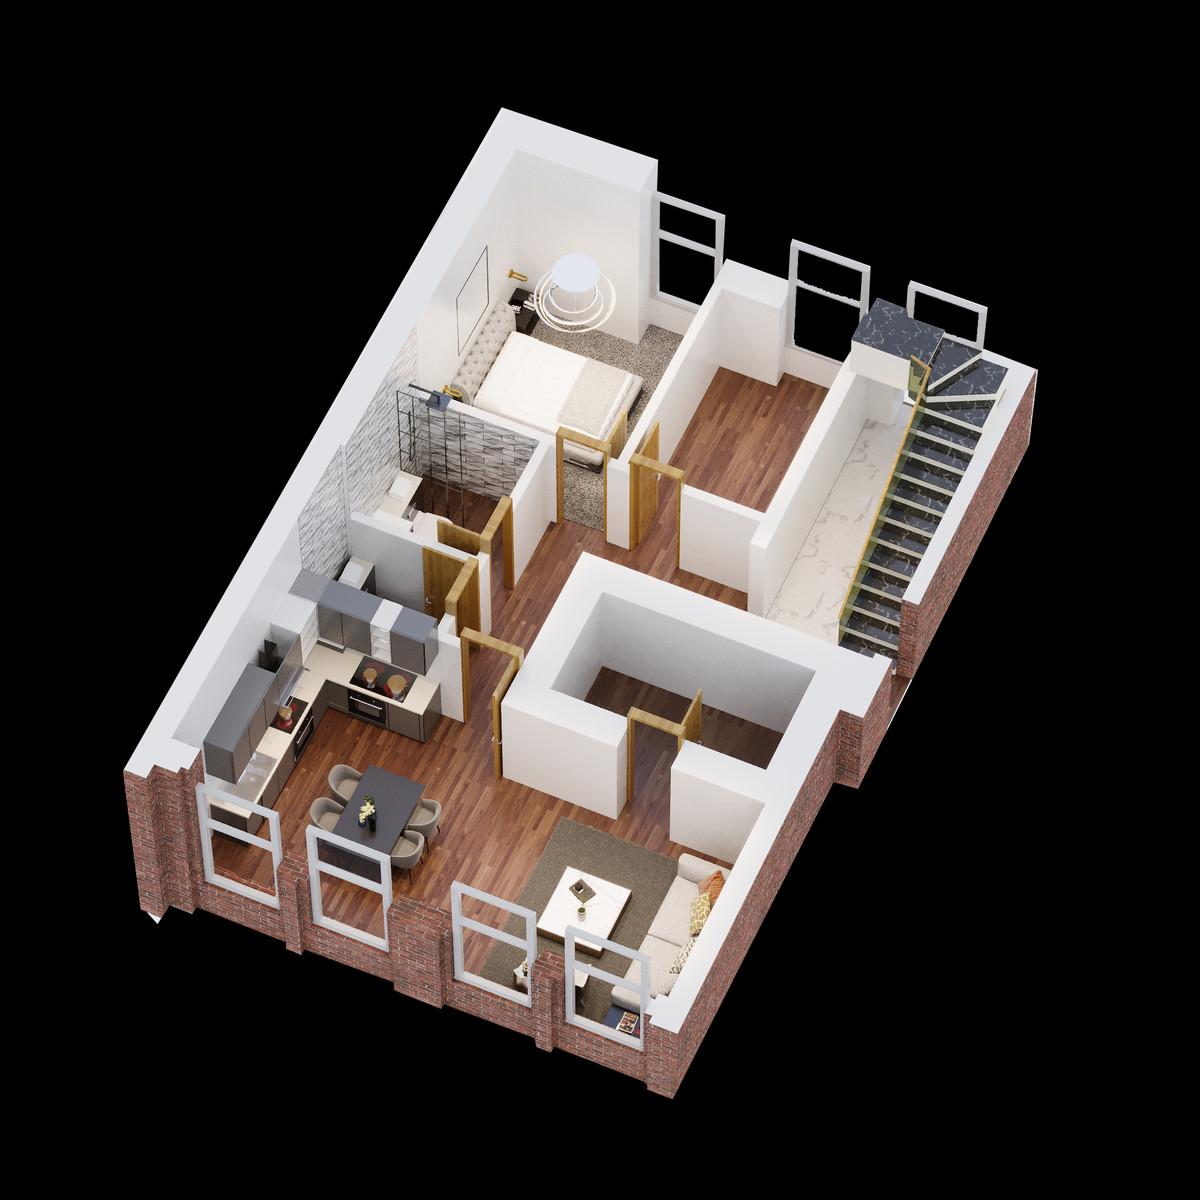 Sydenham Place, 26B Tenby Street, Jewellery Quarter floorplan 1 of 2